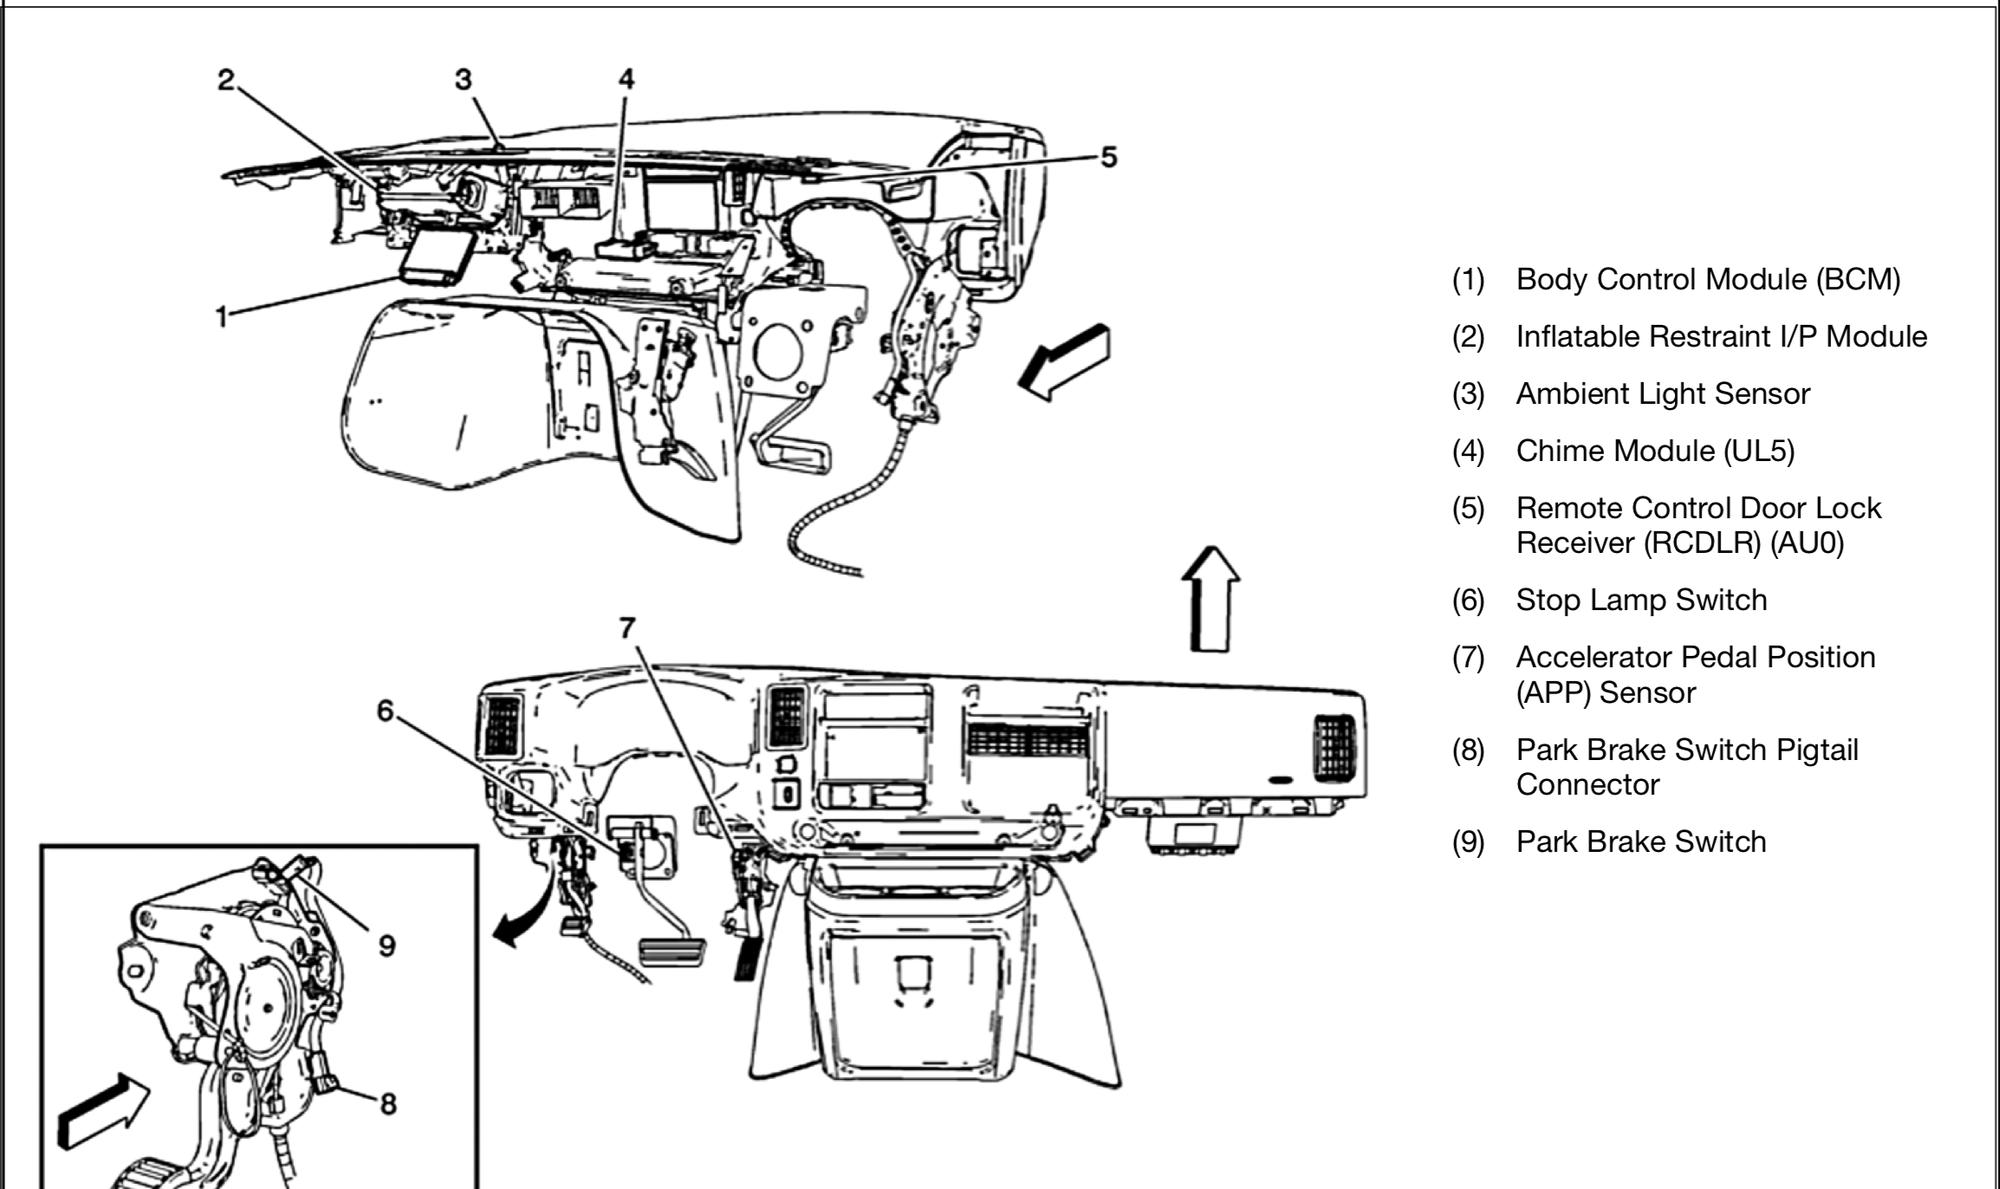 2014 Body Control Module Location - Chevrolet Forum - Chevy